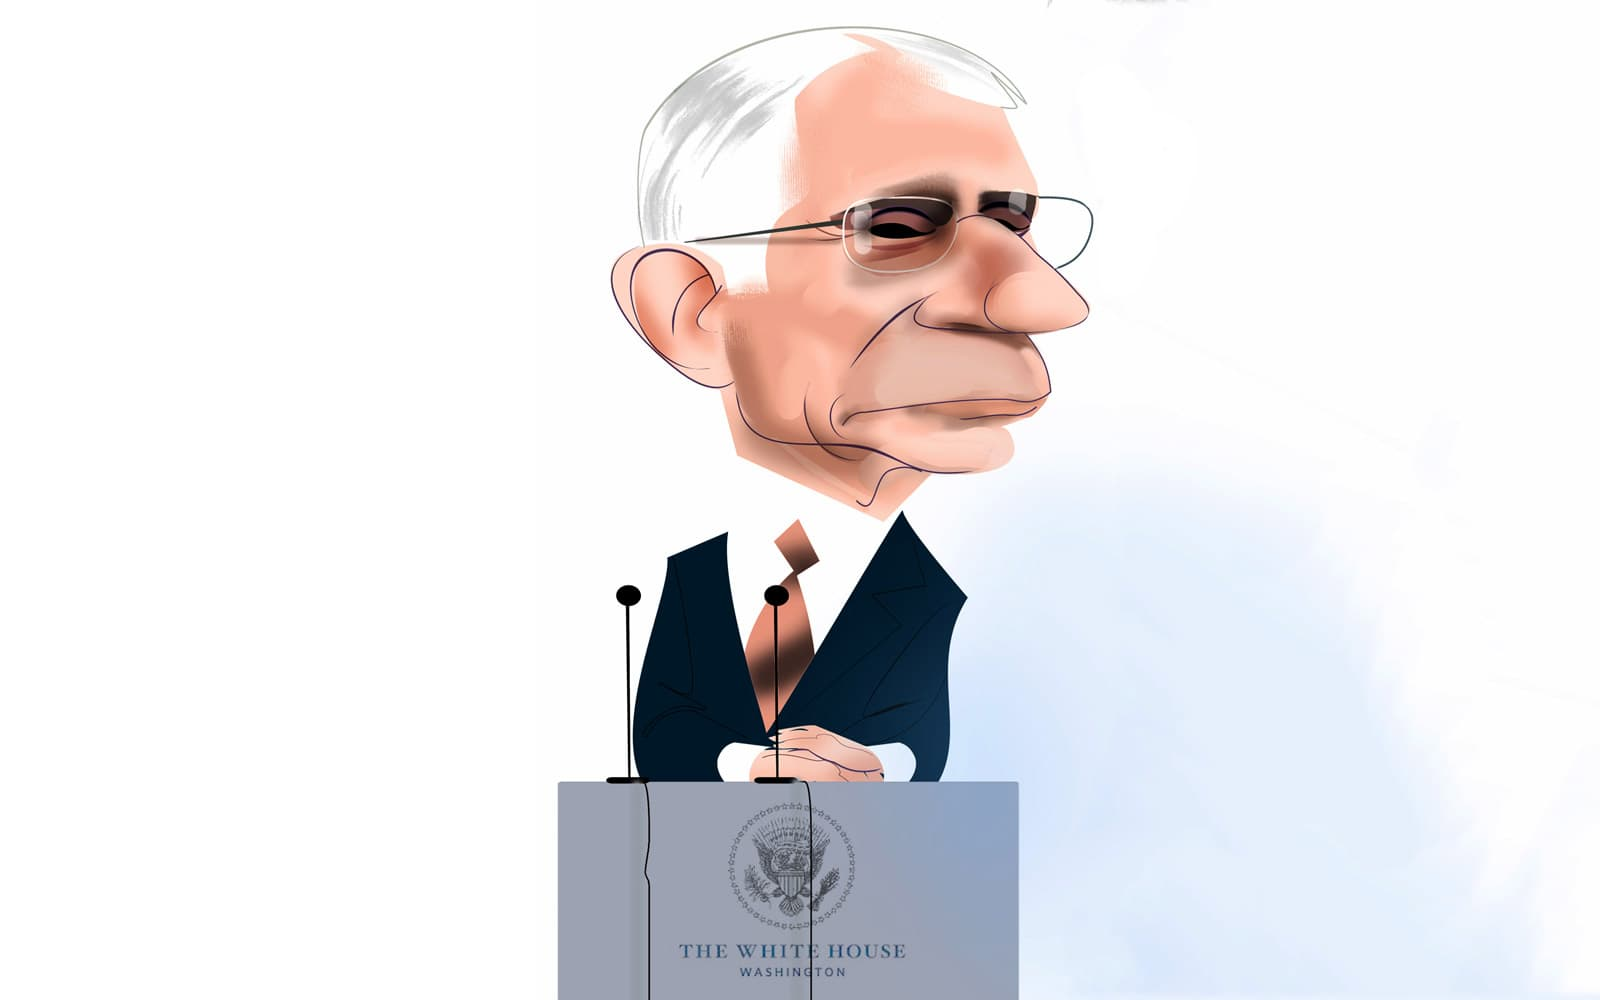 Anthony Fauci. Caricatura de Luis Grañena